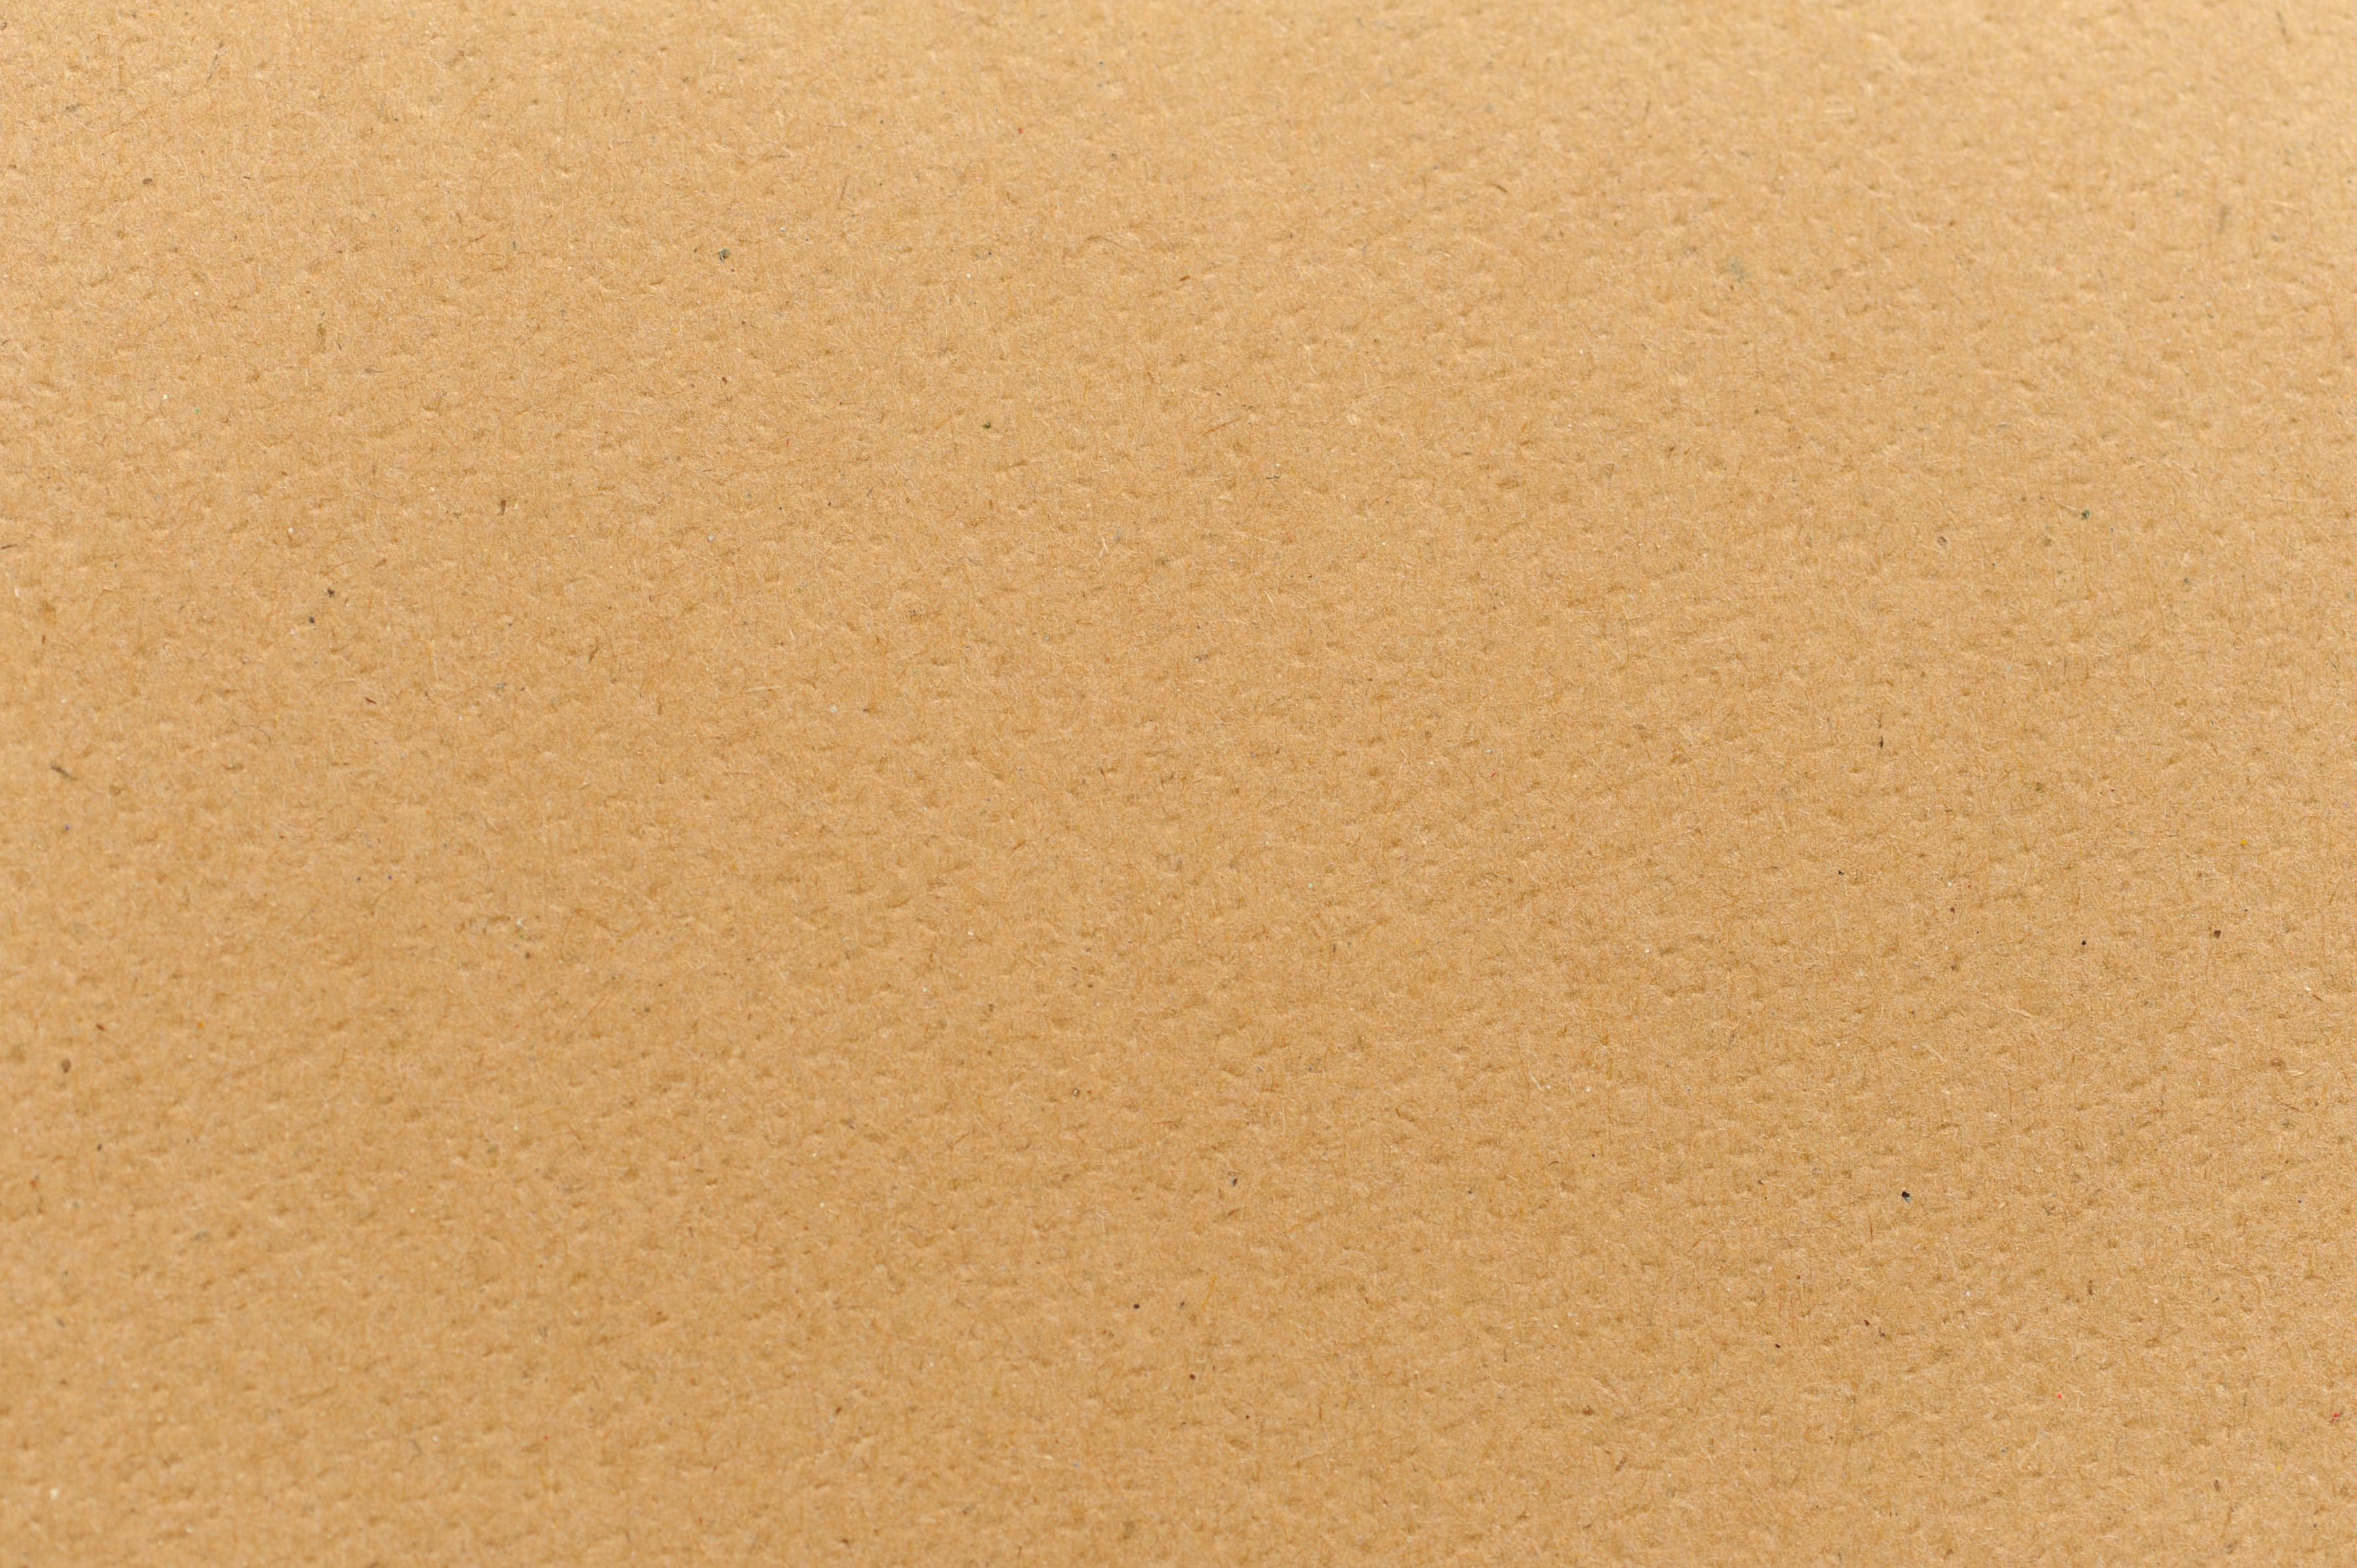 free photo cardboard rough surface paper free download jooinn